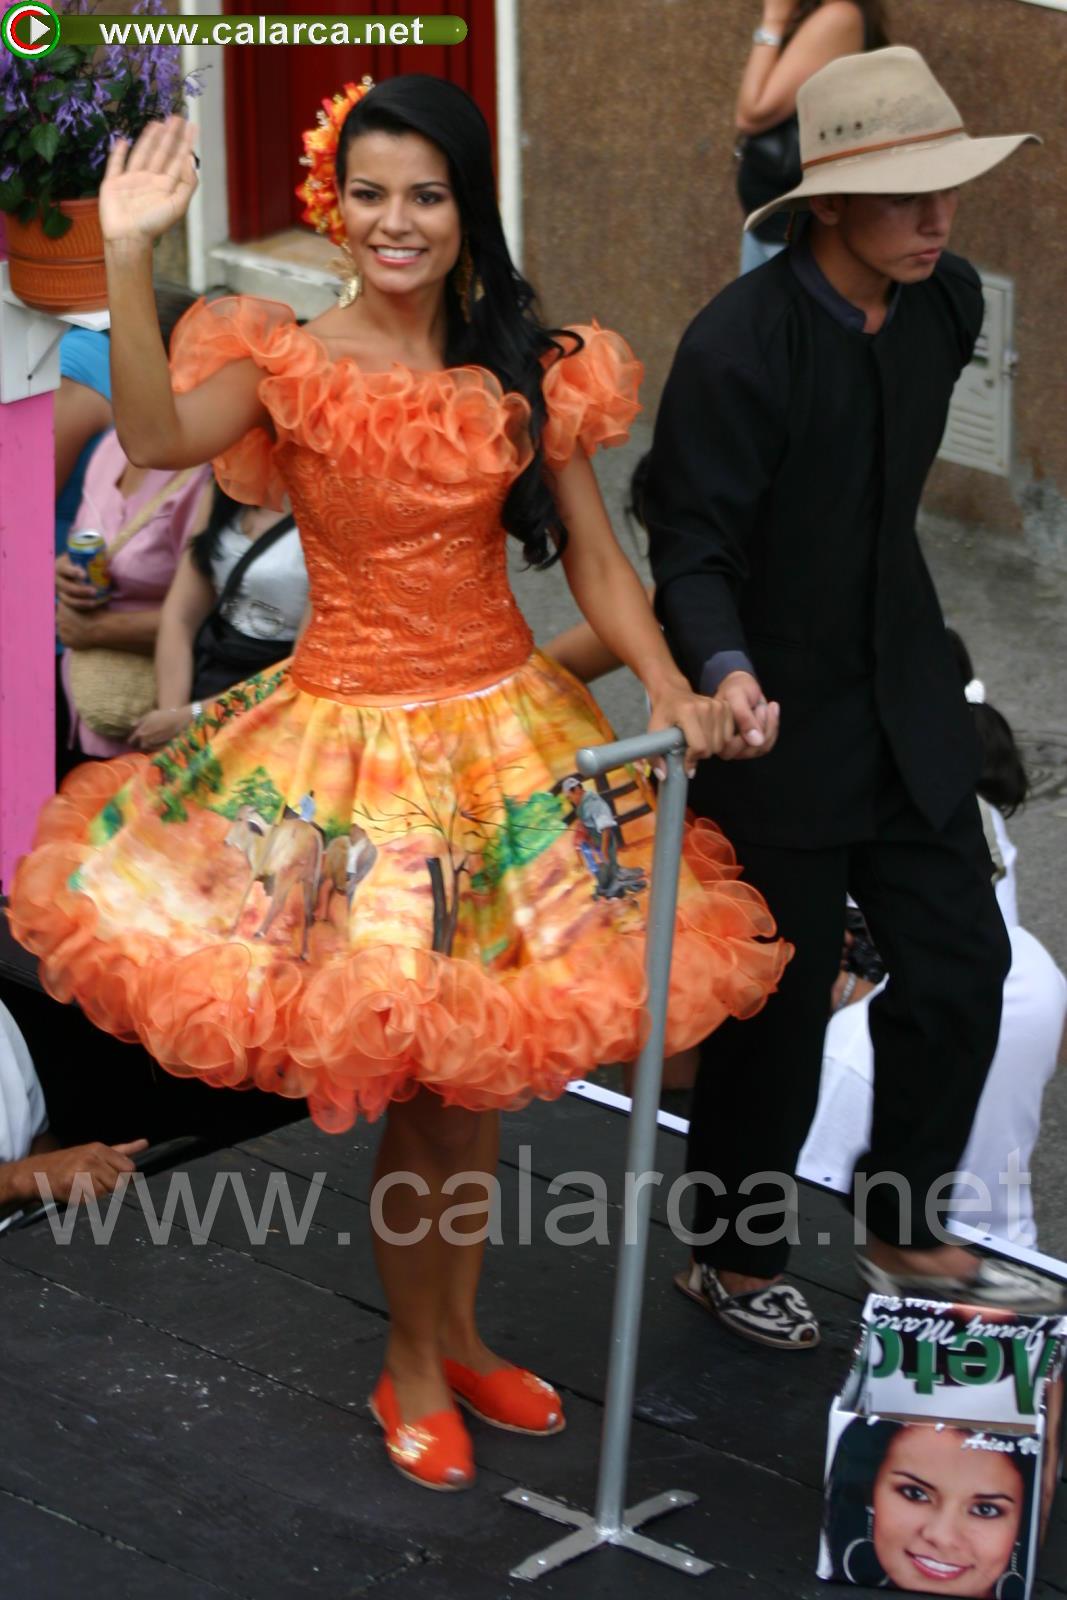 Meta - Yenny Marcela Arias Villada